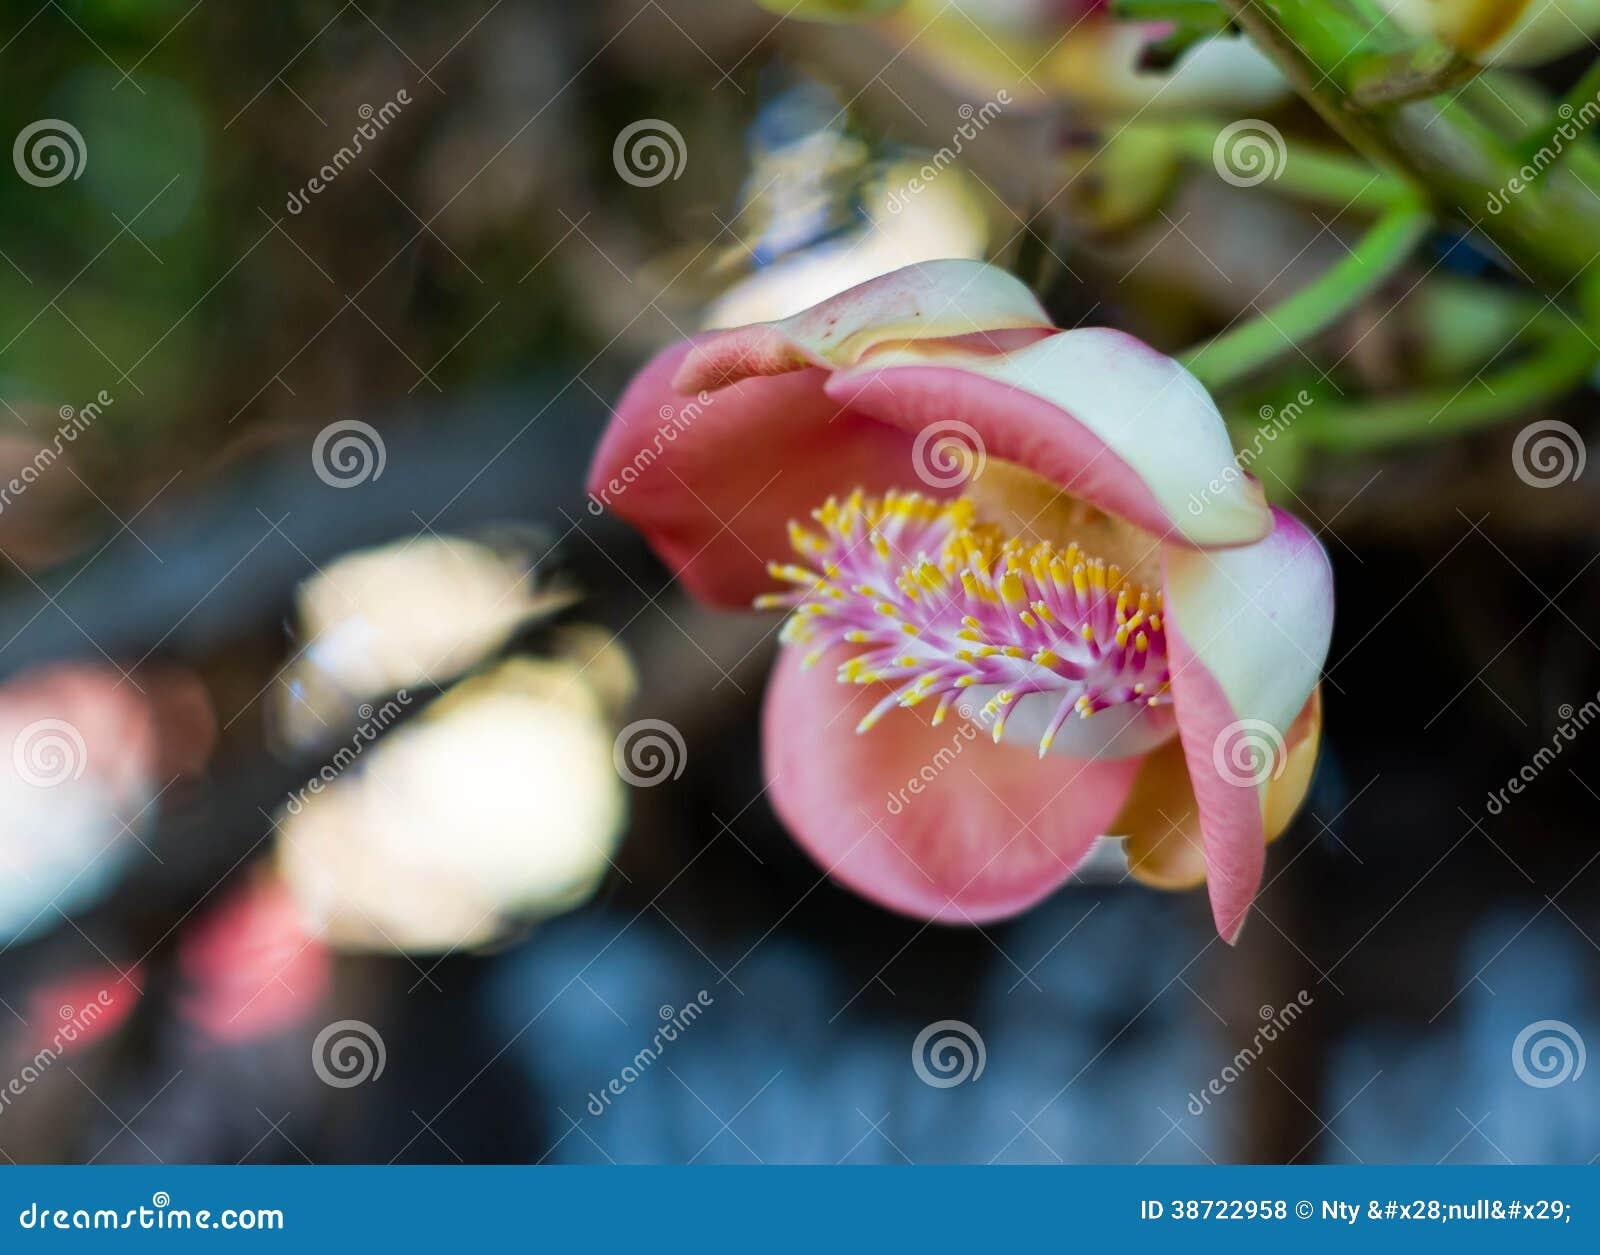 Shorea Robusta Stock Photo Image Of Perennial Colorful 38722958